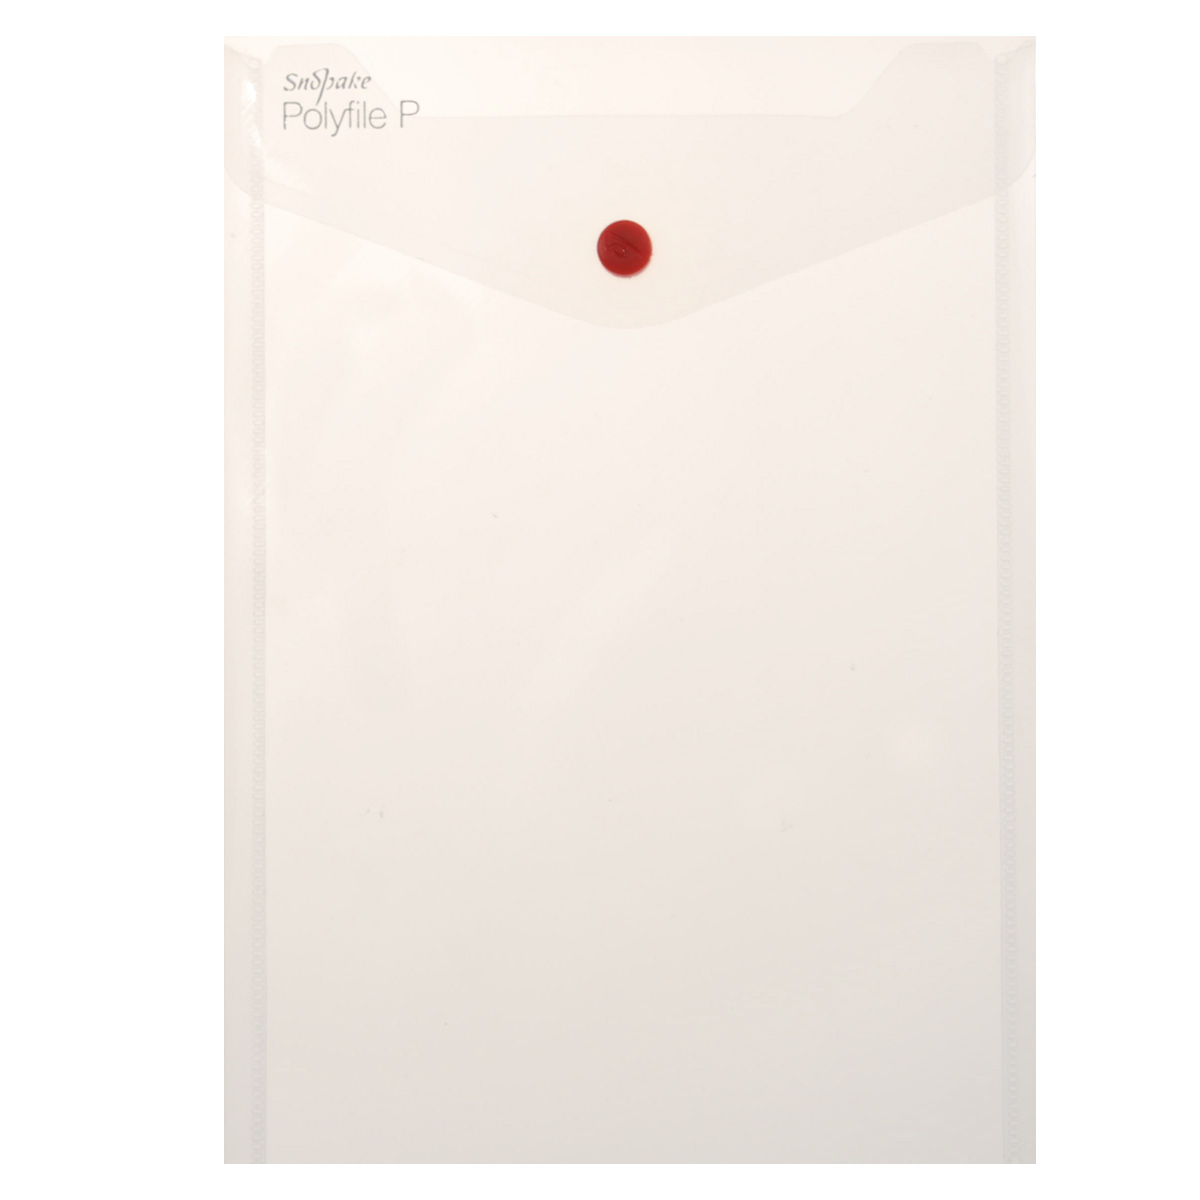 Папка-конверт на кнопке Snopake Polyfile P, вертикальная, цвет: прозрачный. Формат А5K13280